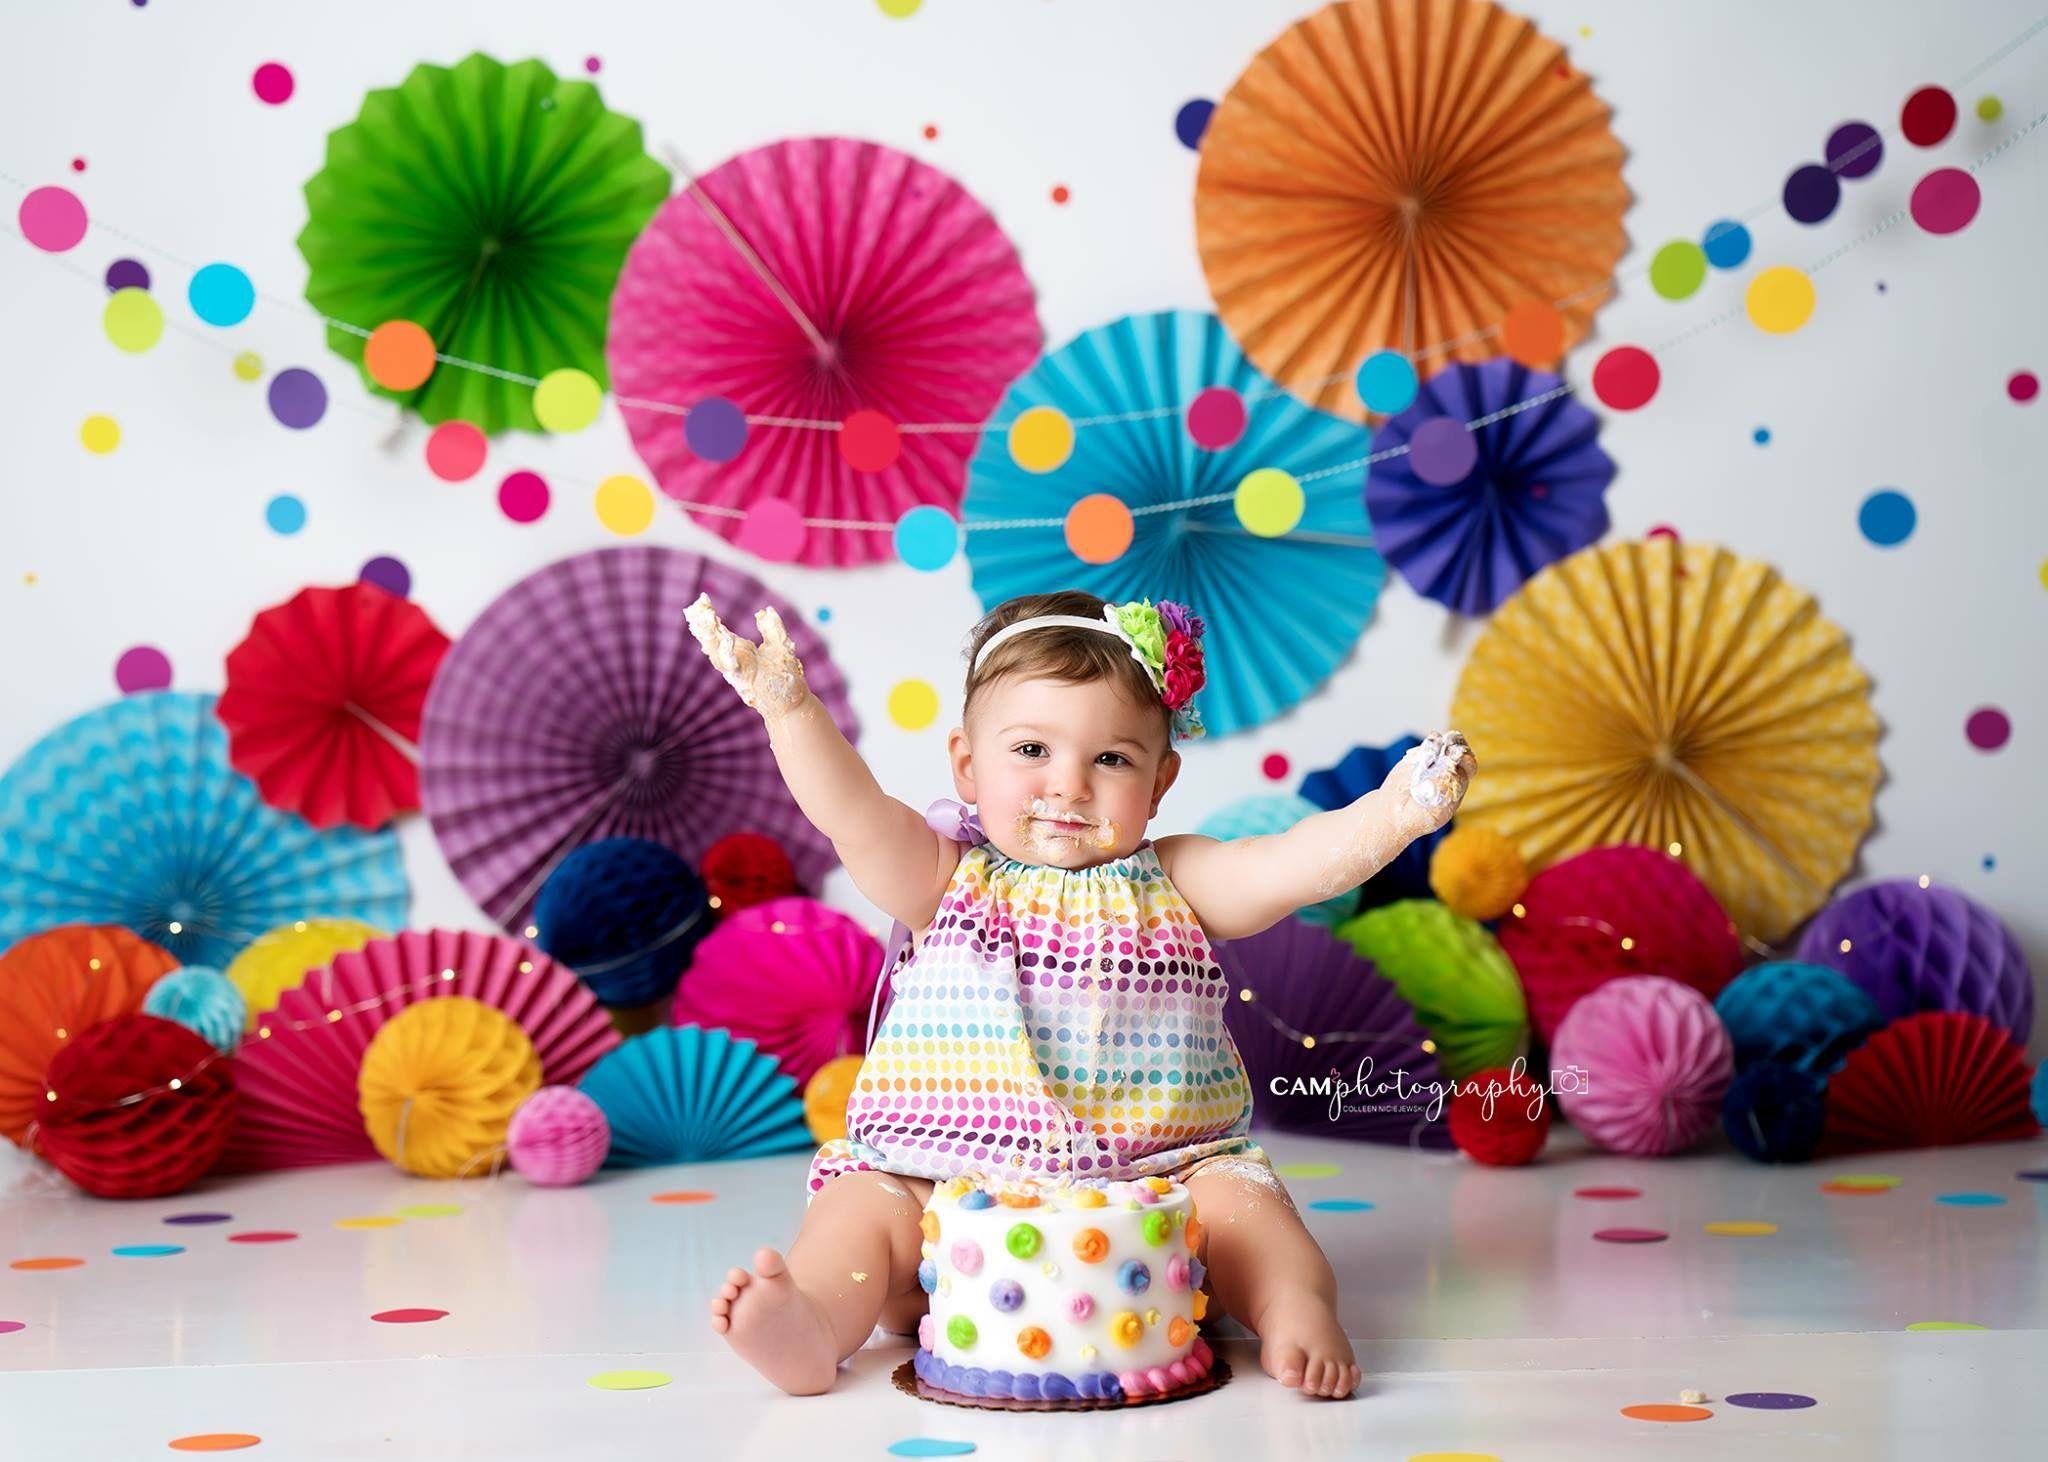 Bright Rainbow Colorful Cake Smash Polkadots Rainbow Bright Cakesmash Photography 1st Birthday Decorations Smash Cake Girl Candy Land Birthday Party